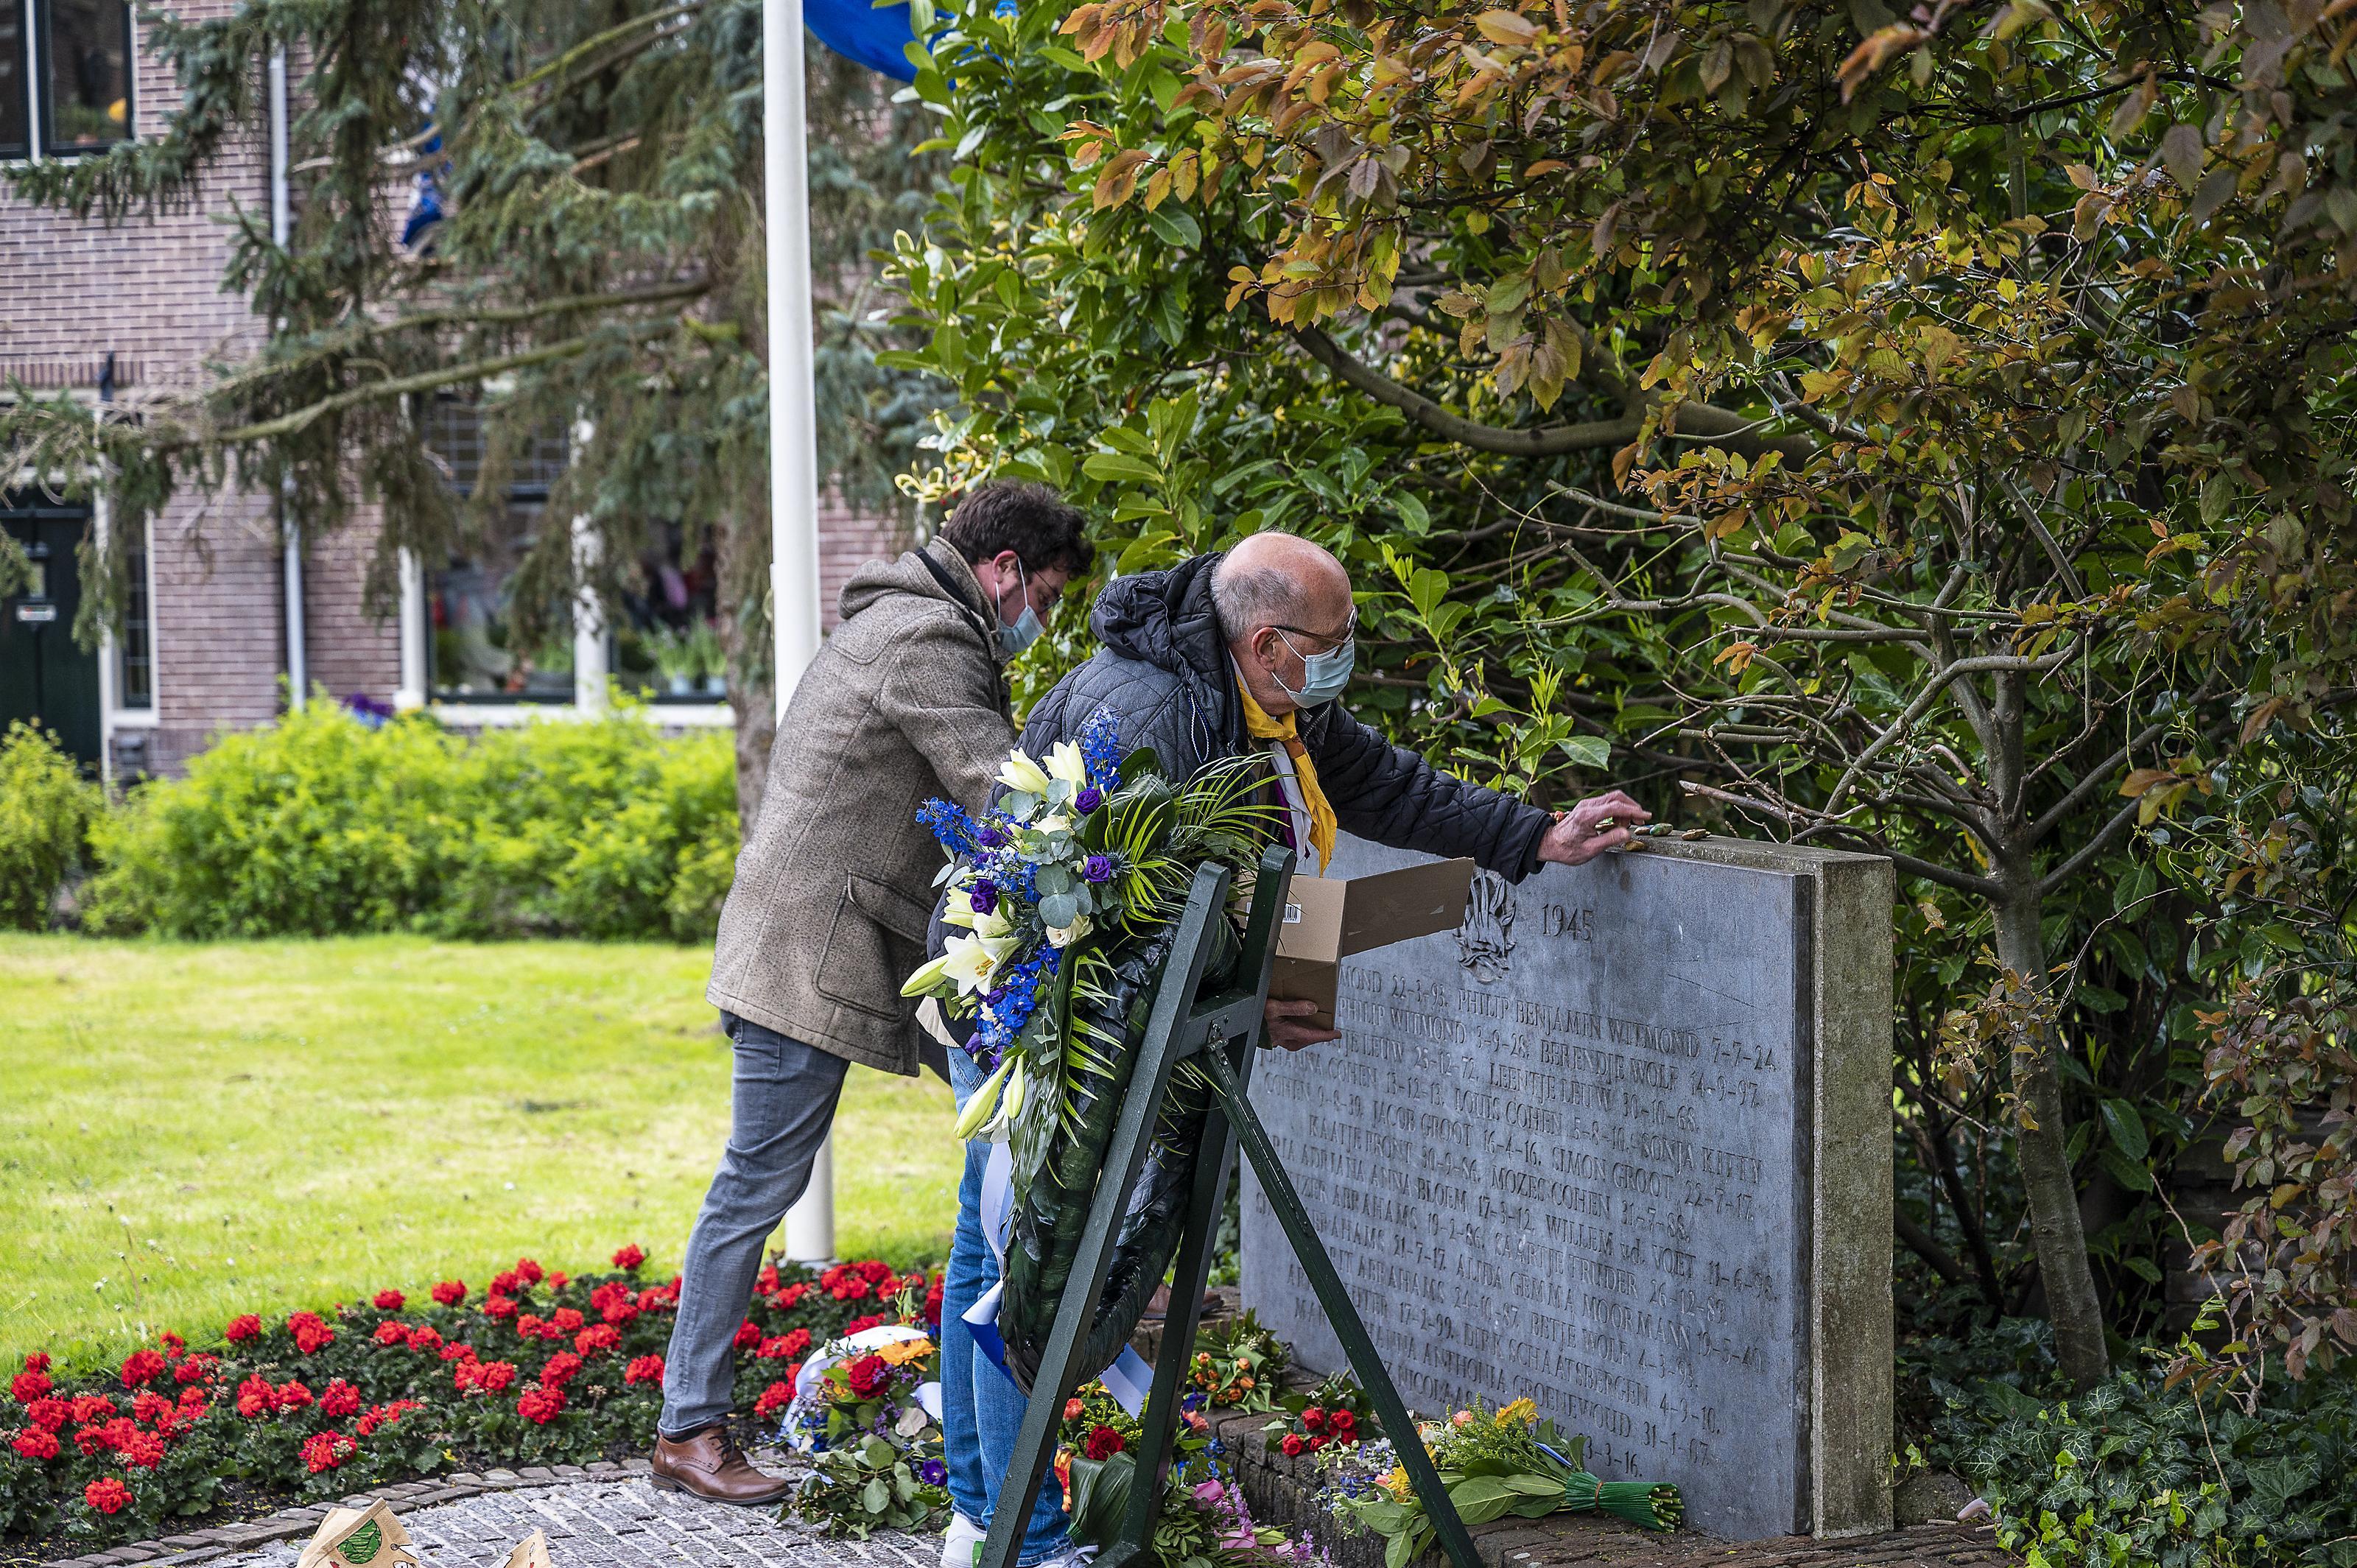 Scoutinggroep Waterland legt beschilderde stenen neer bij monument in Monnickendam